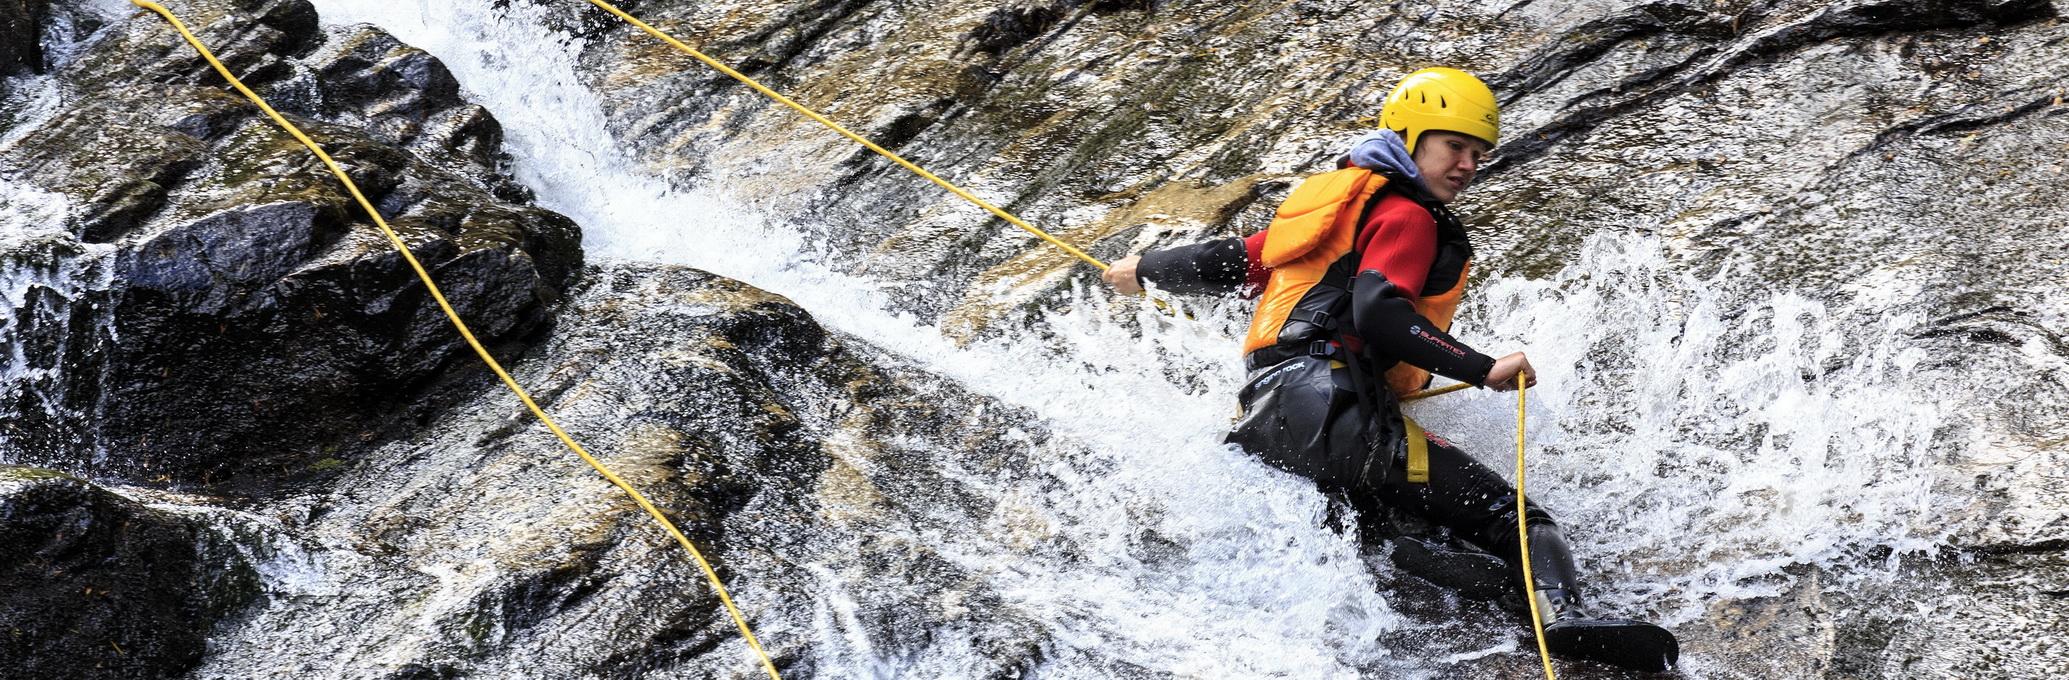 juving canyoning norge canyoning geilo juving alpene